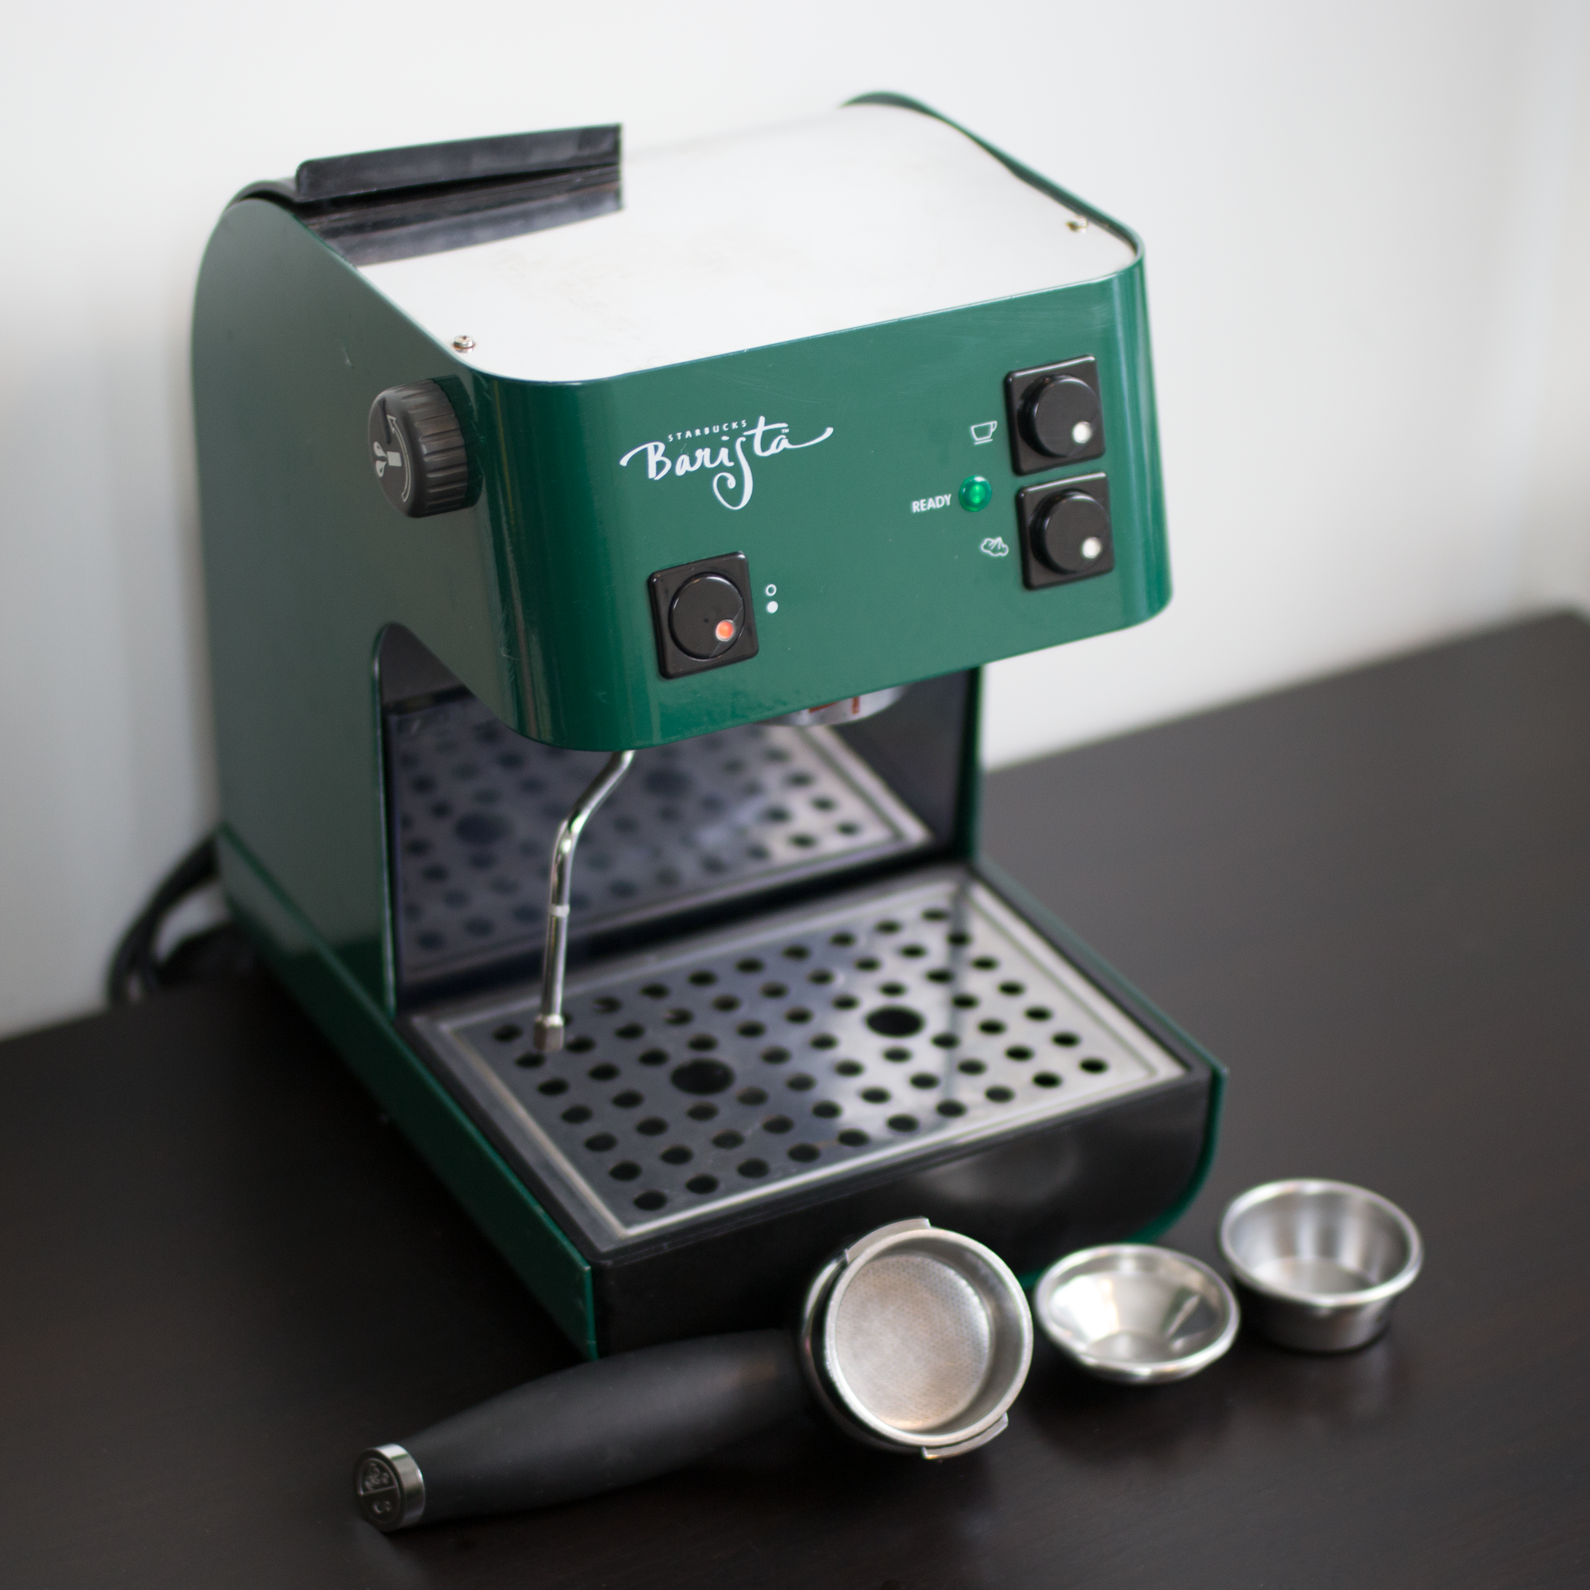 Starbucks Barista Seattle Espresso Machine Green Saeco SIN